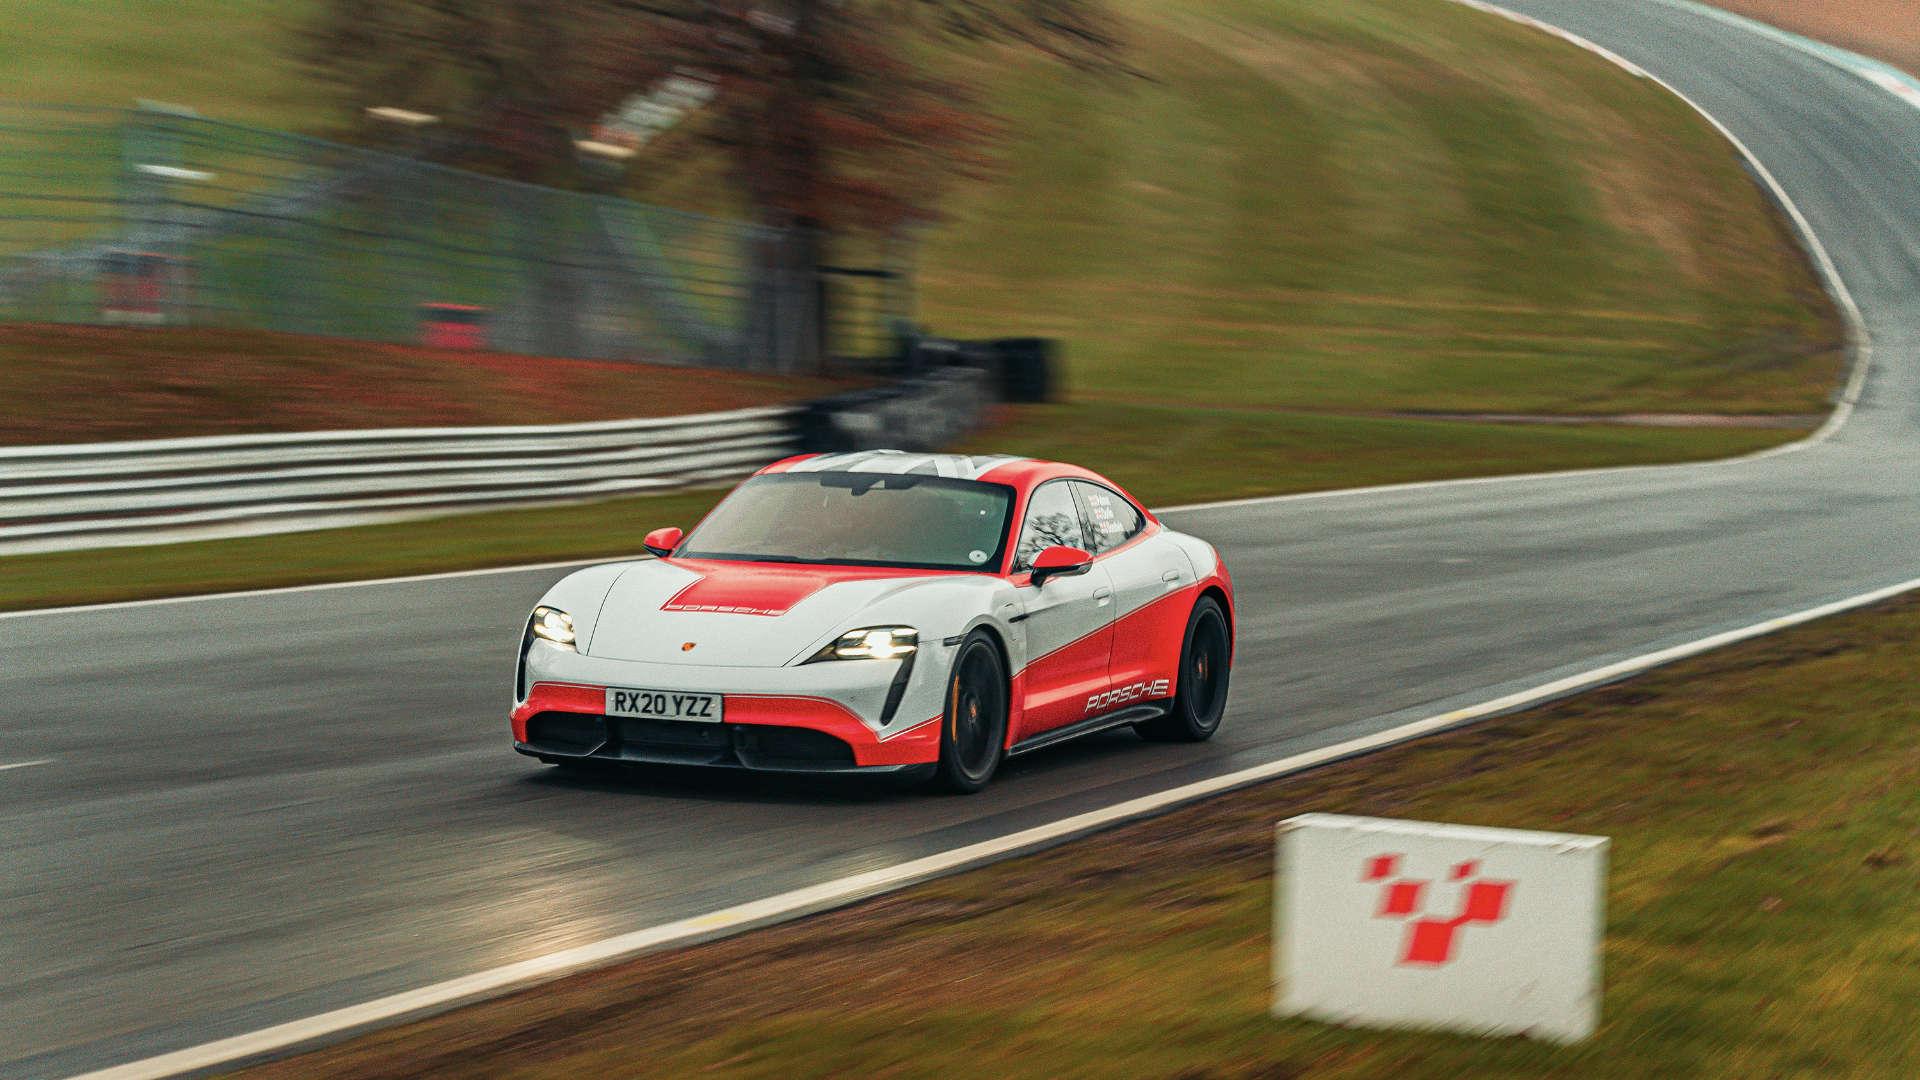 Porsche Taycan Rekorde in Brands Hatch